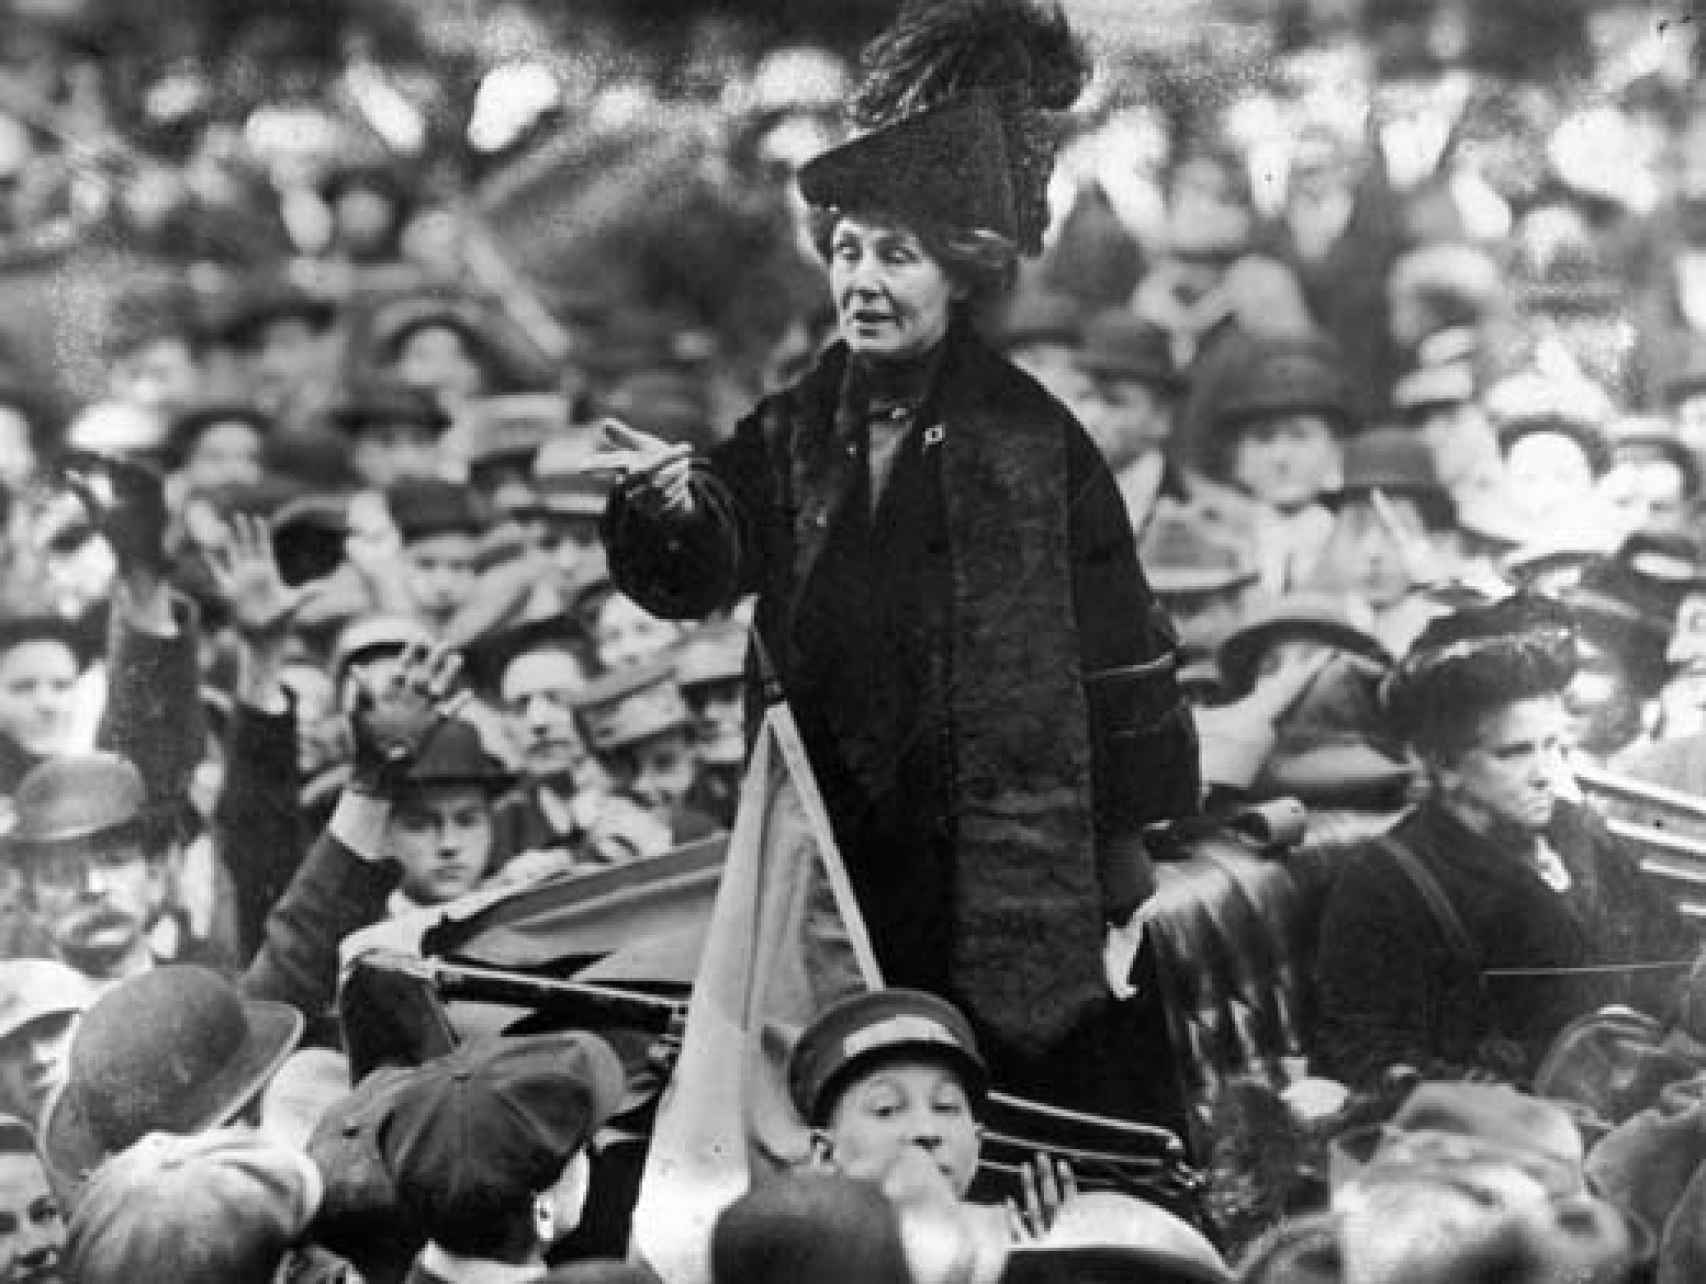 La feminista y sufragista Emmeline Pankhurst, en uno de sus discursos.